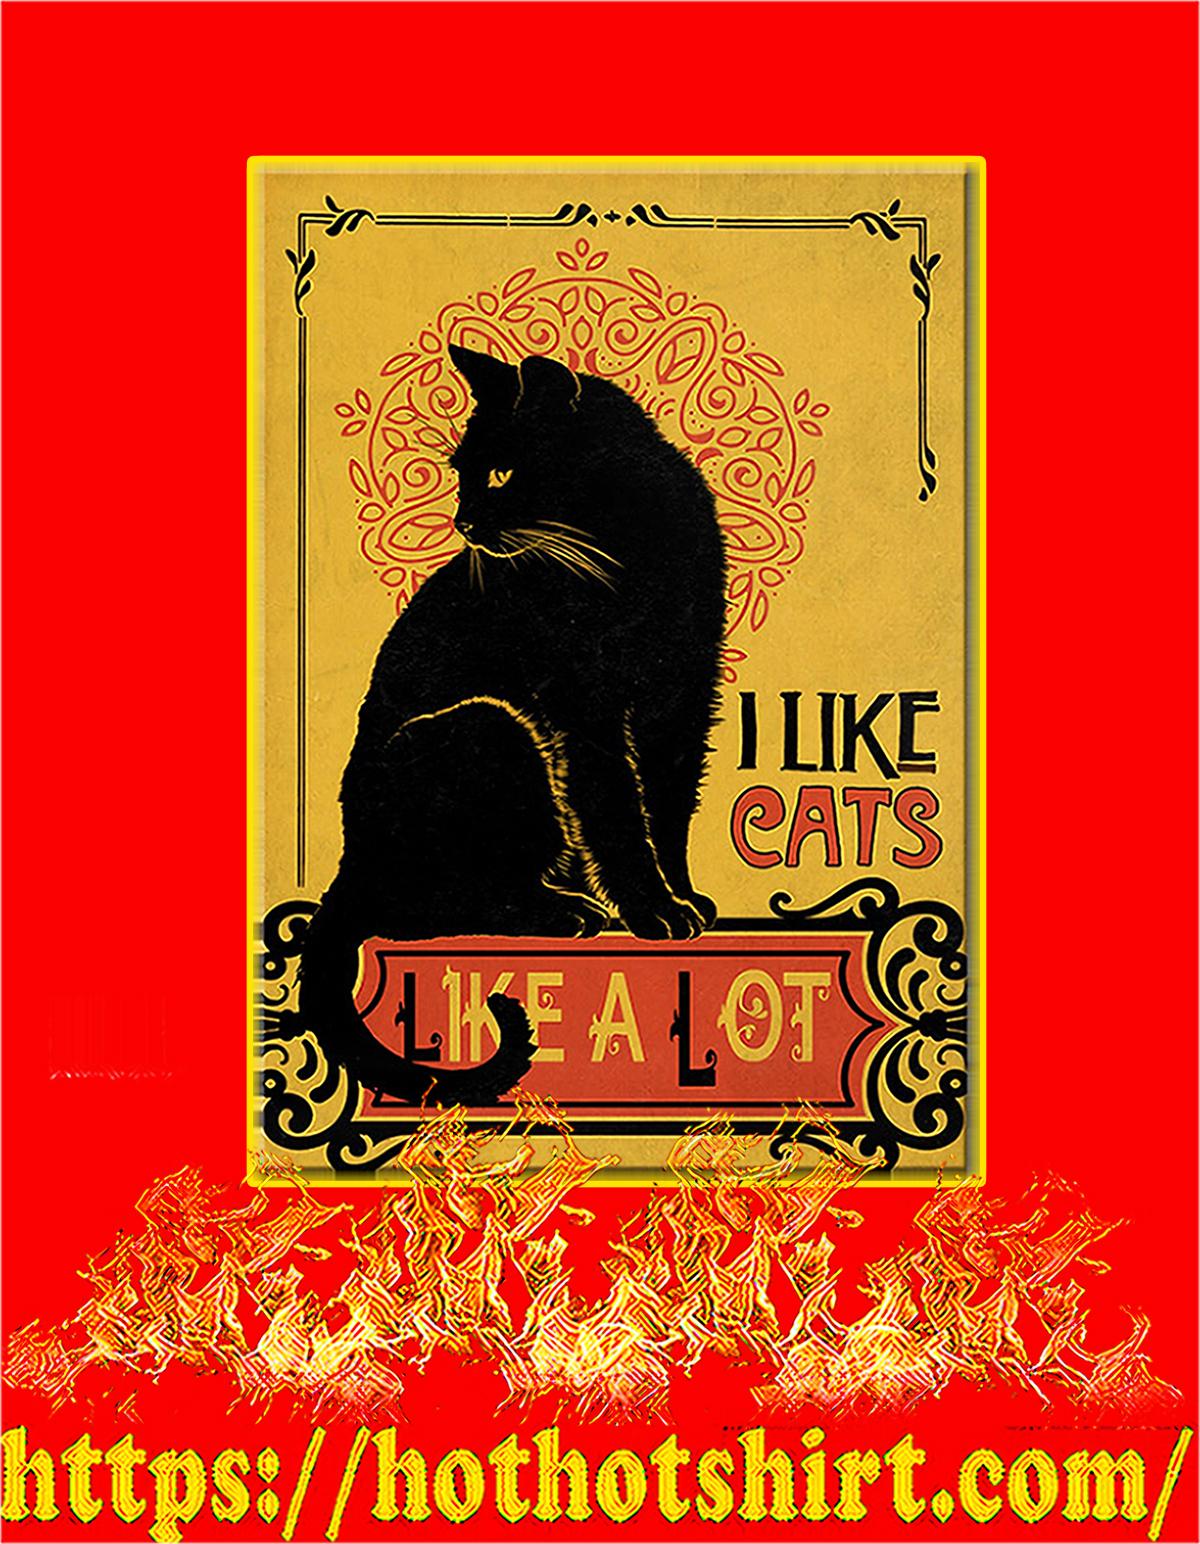 Black cat I like cats like a lot poster